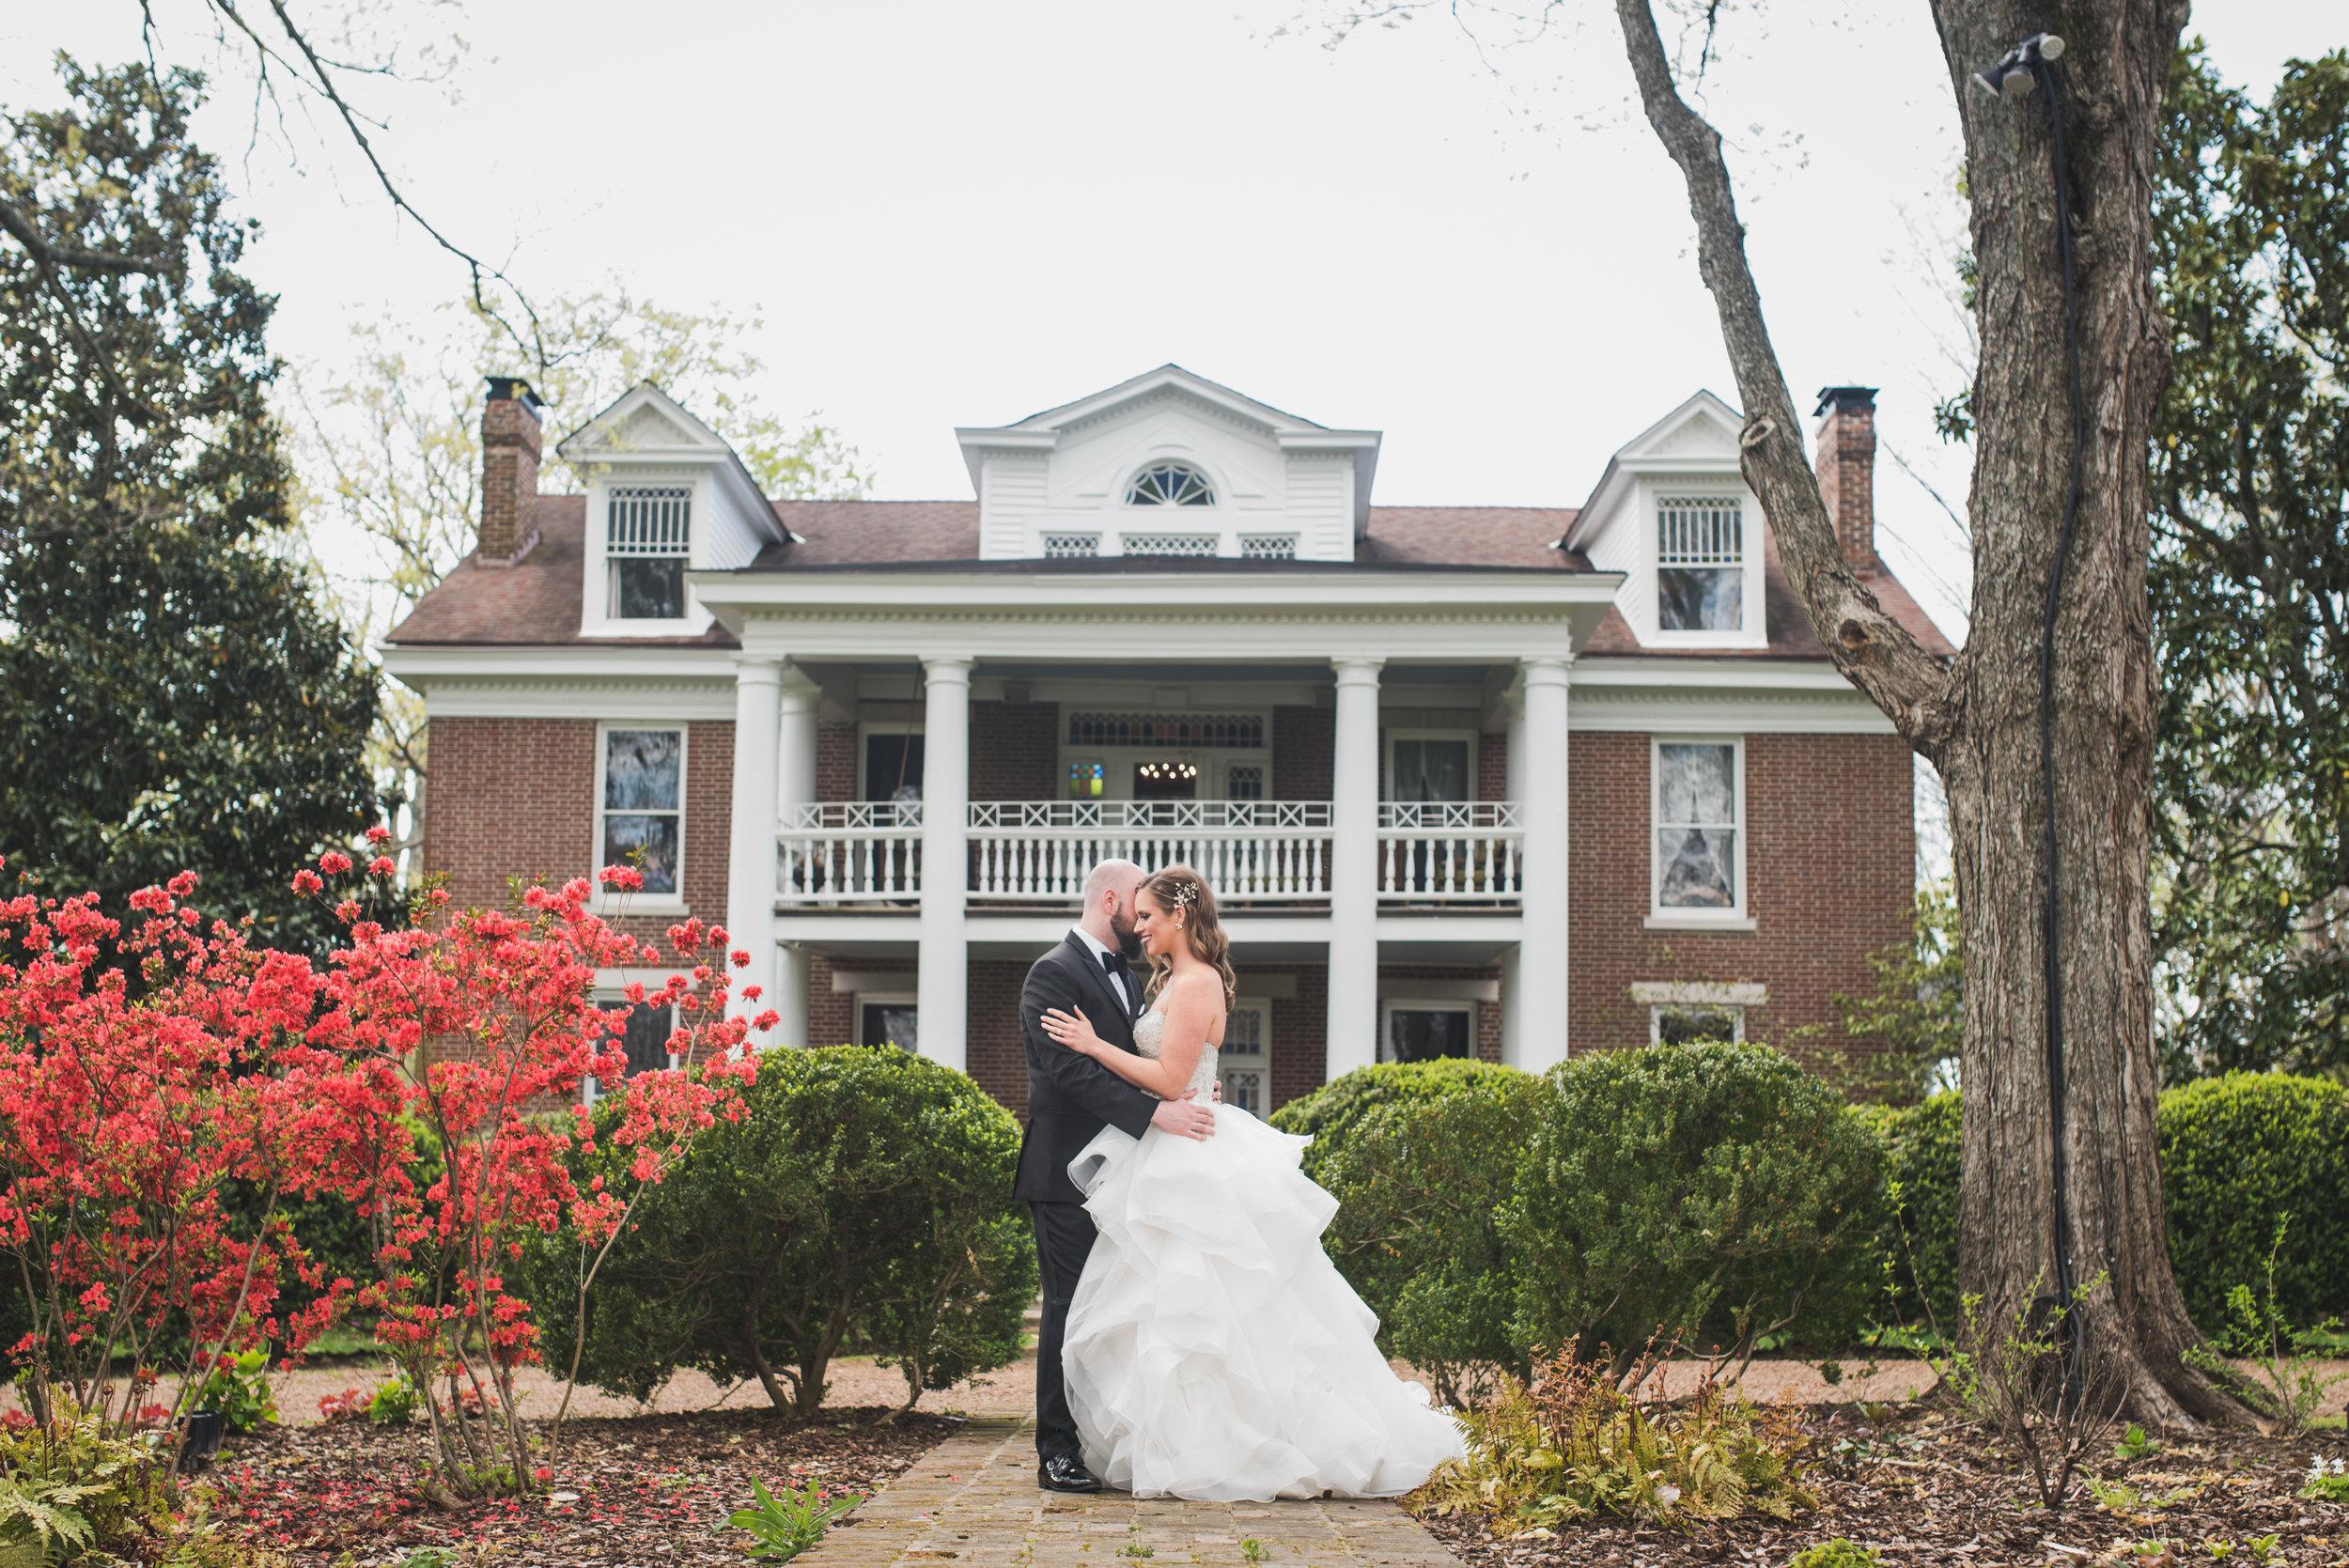 Nashville-Wedding-Photographer-Favorites122.jpg